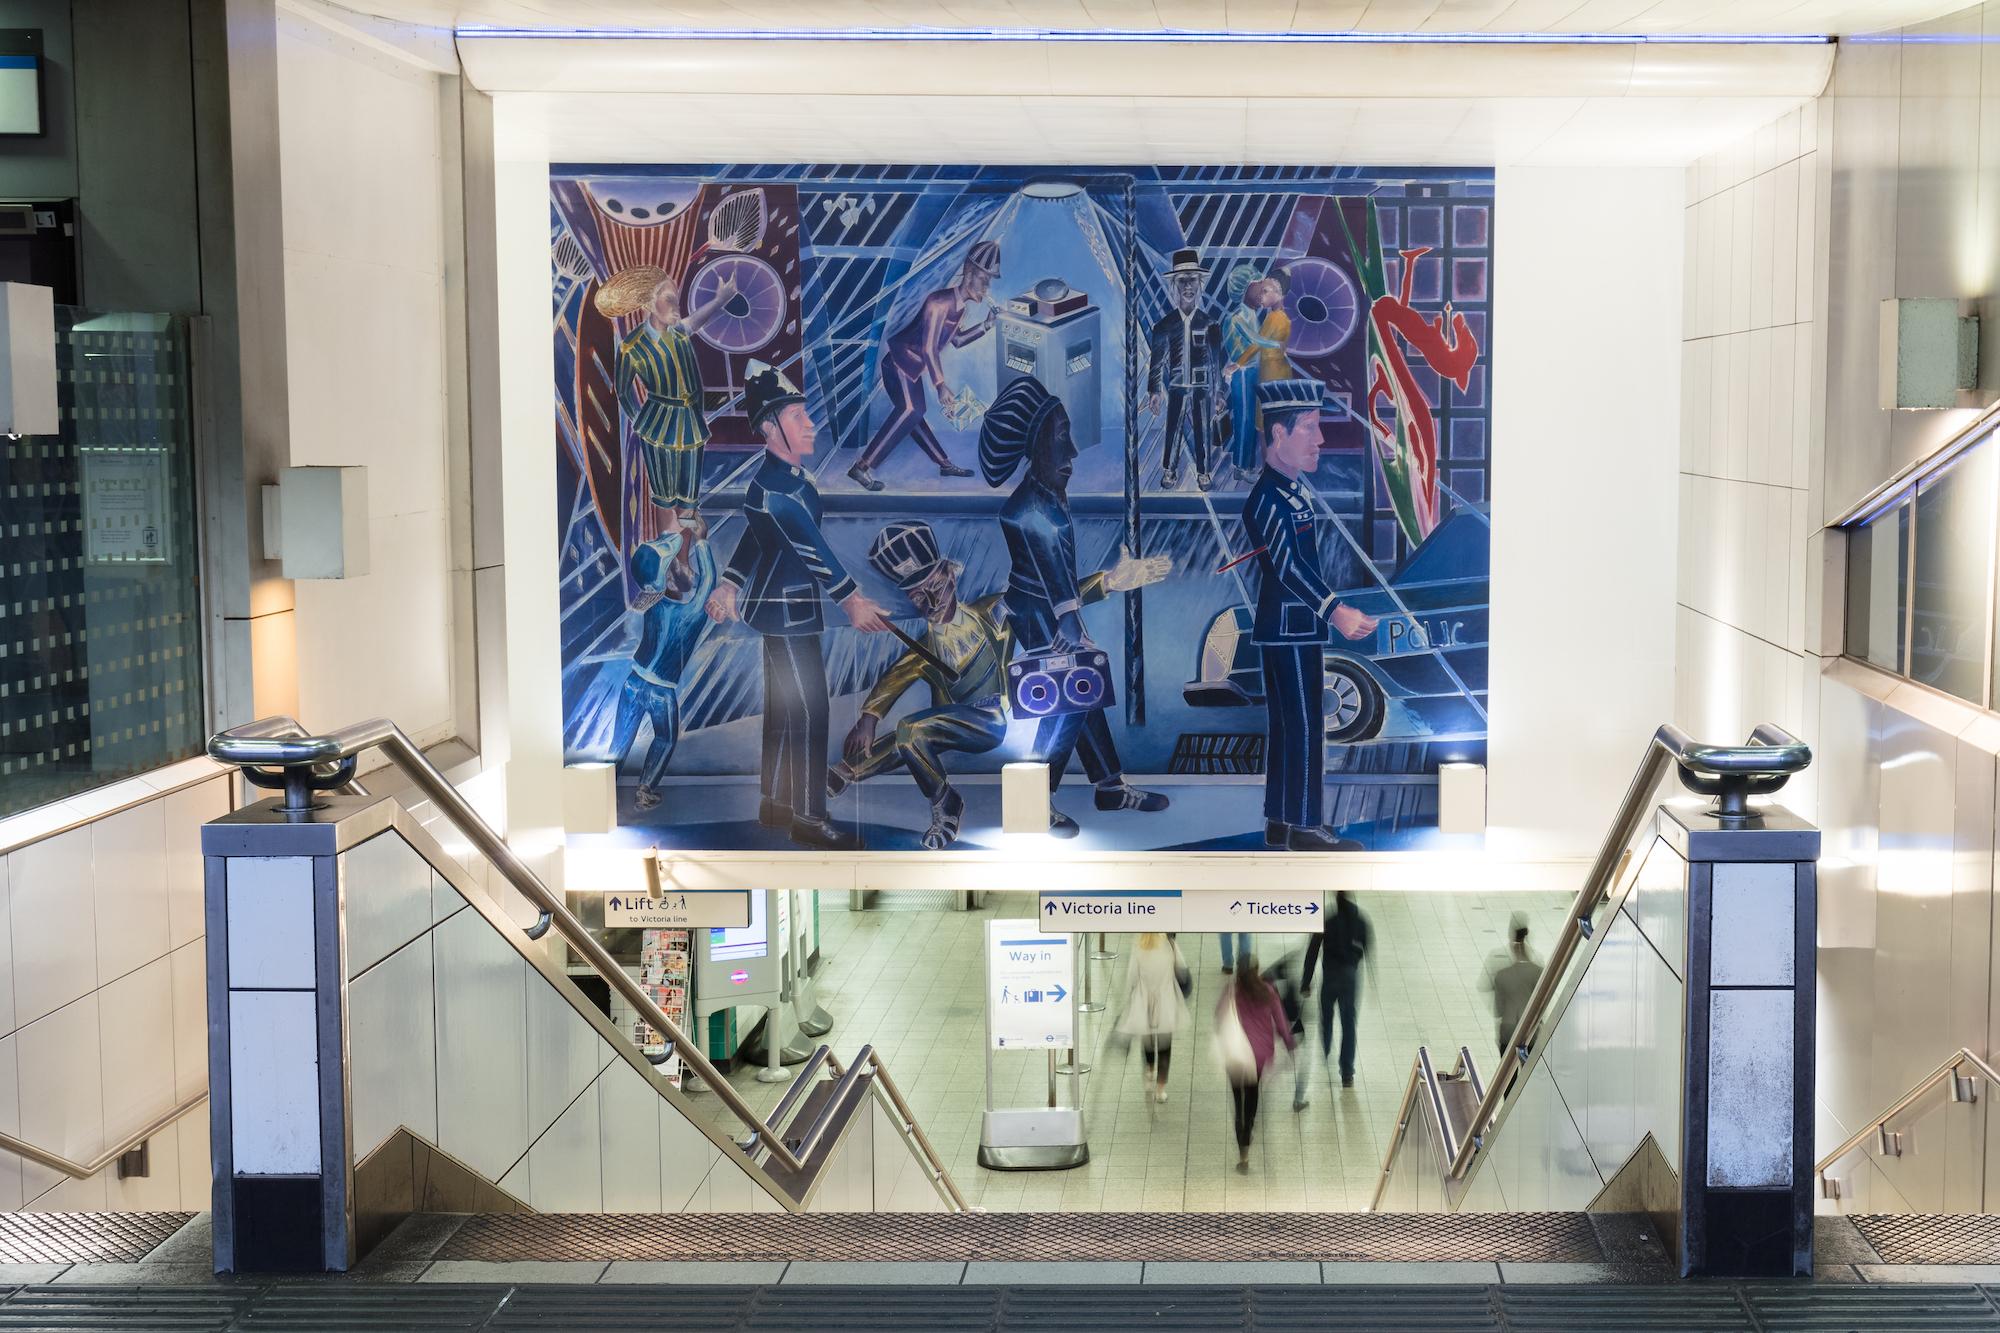 Denzil Forrester, Brixton Blue at Brixton Station